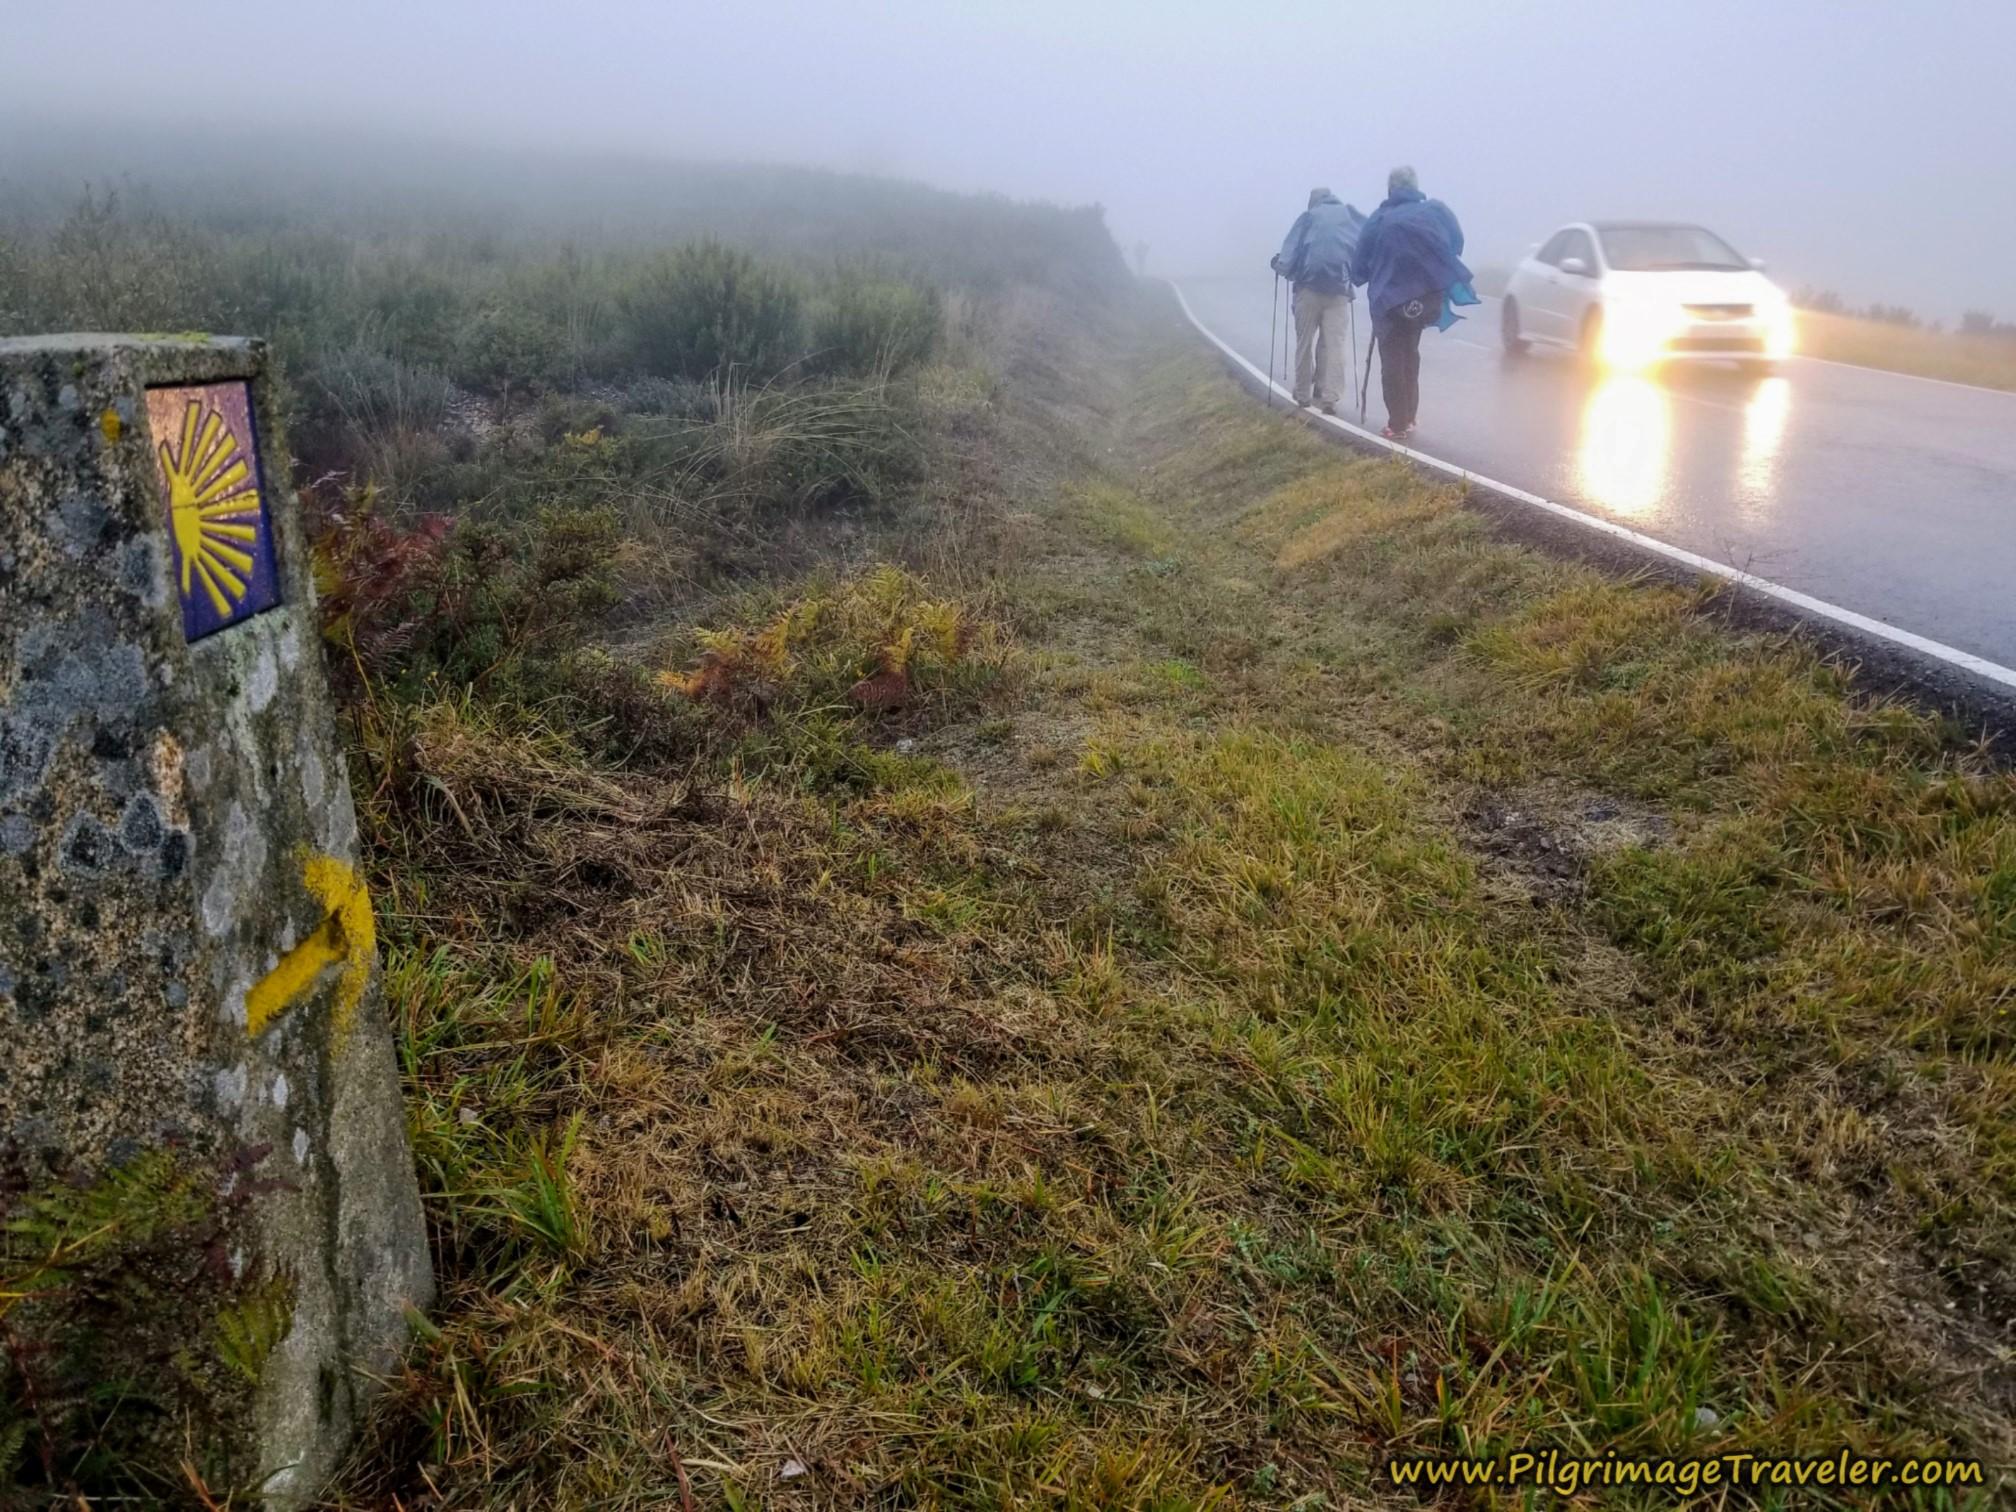 Camino Waymark and Headlights on the Camino Sanabrés from A Gudiña to A Venda da Capela